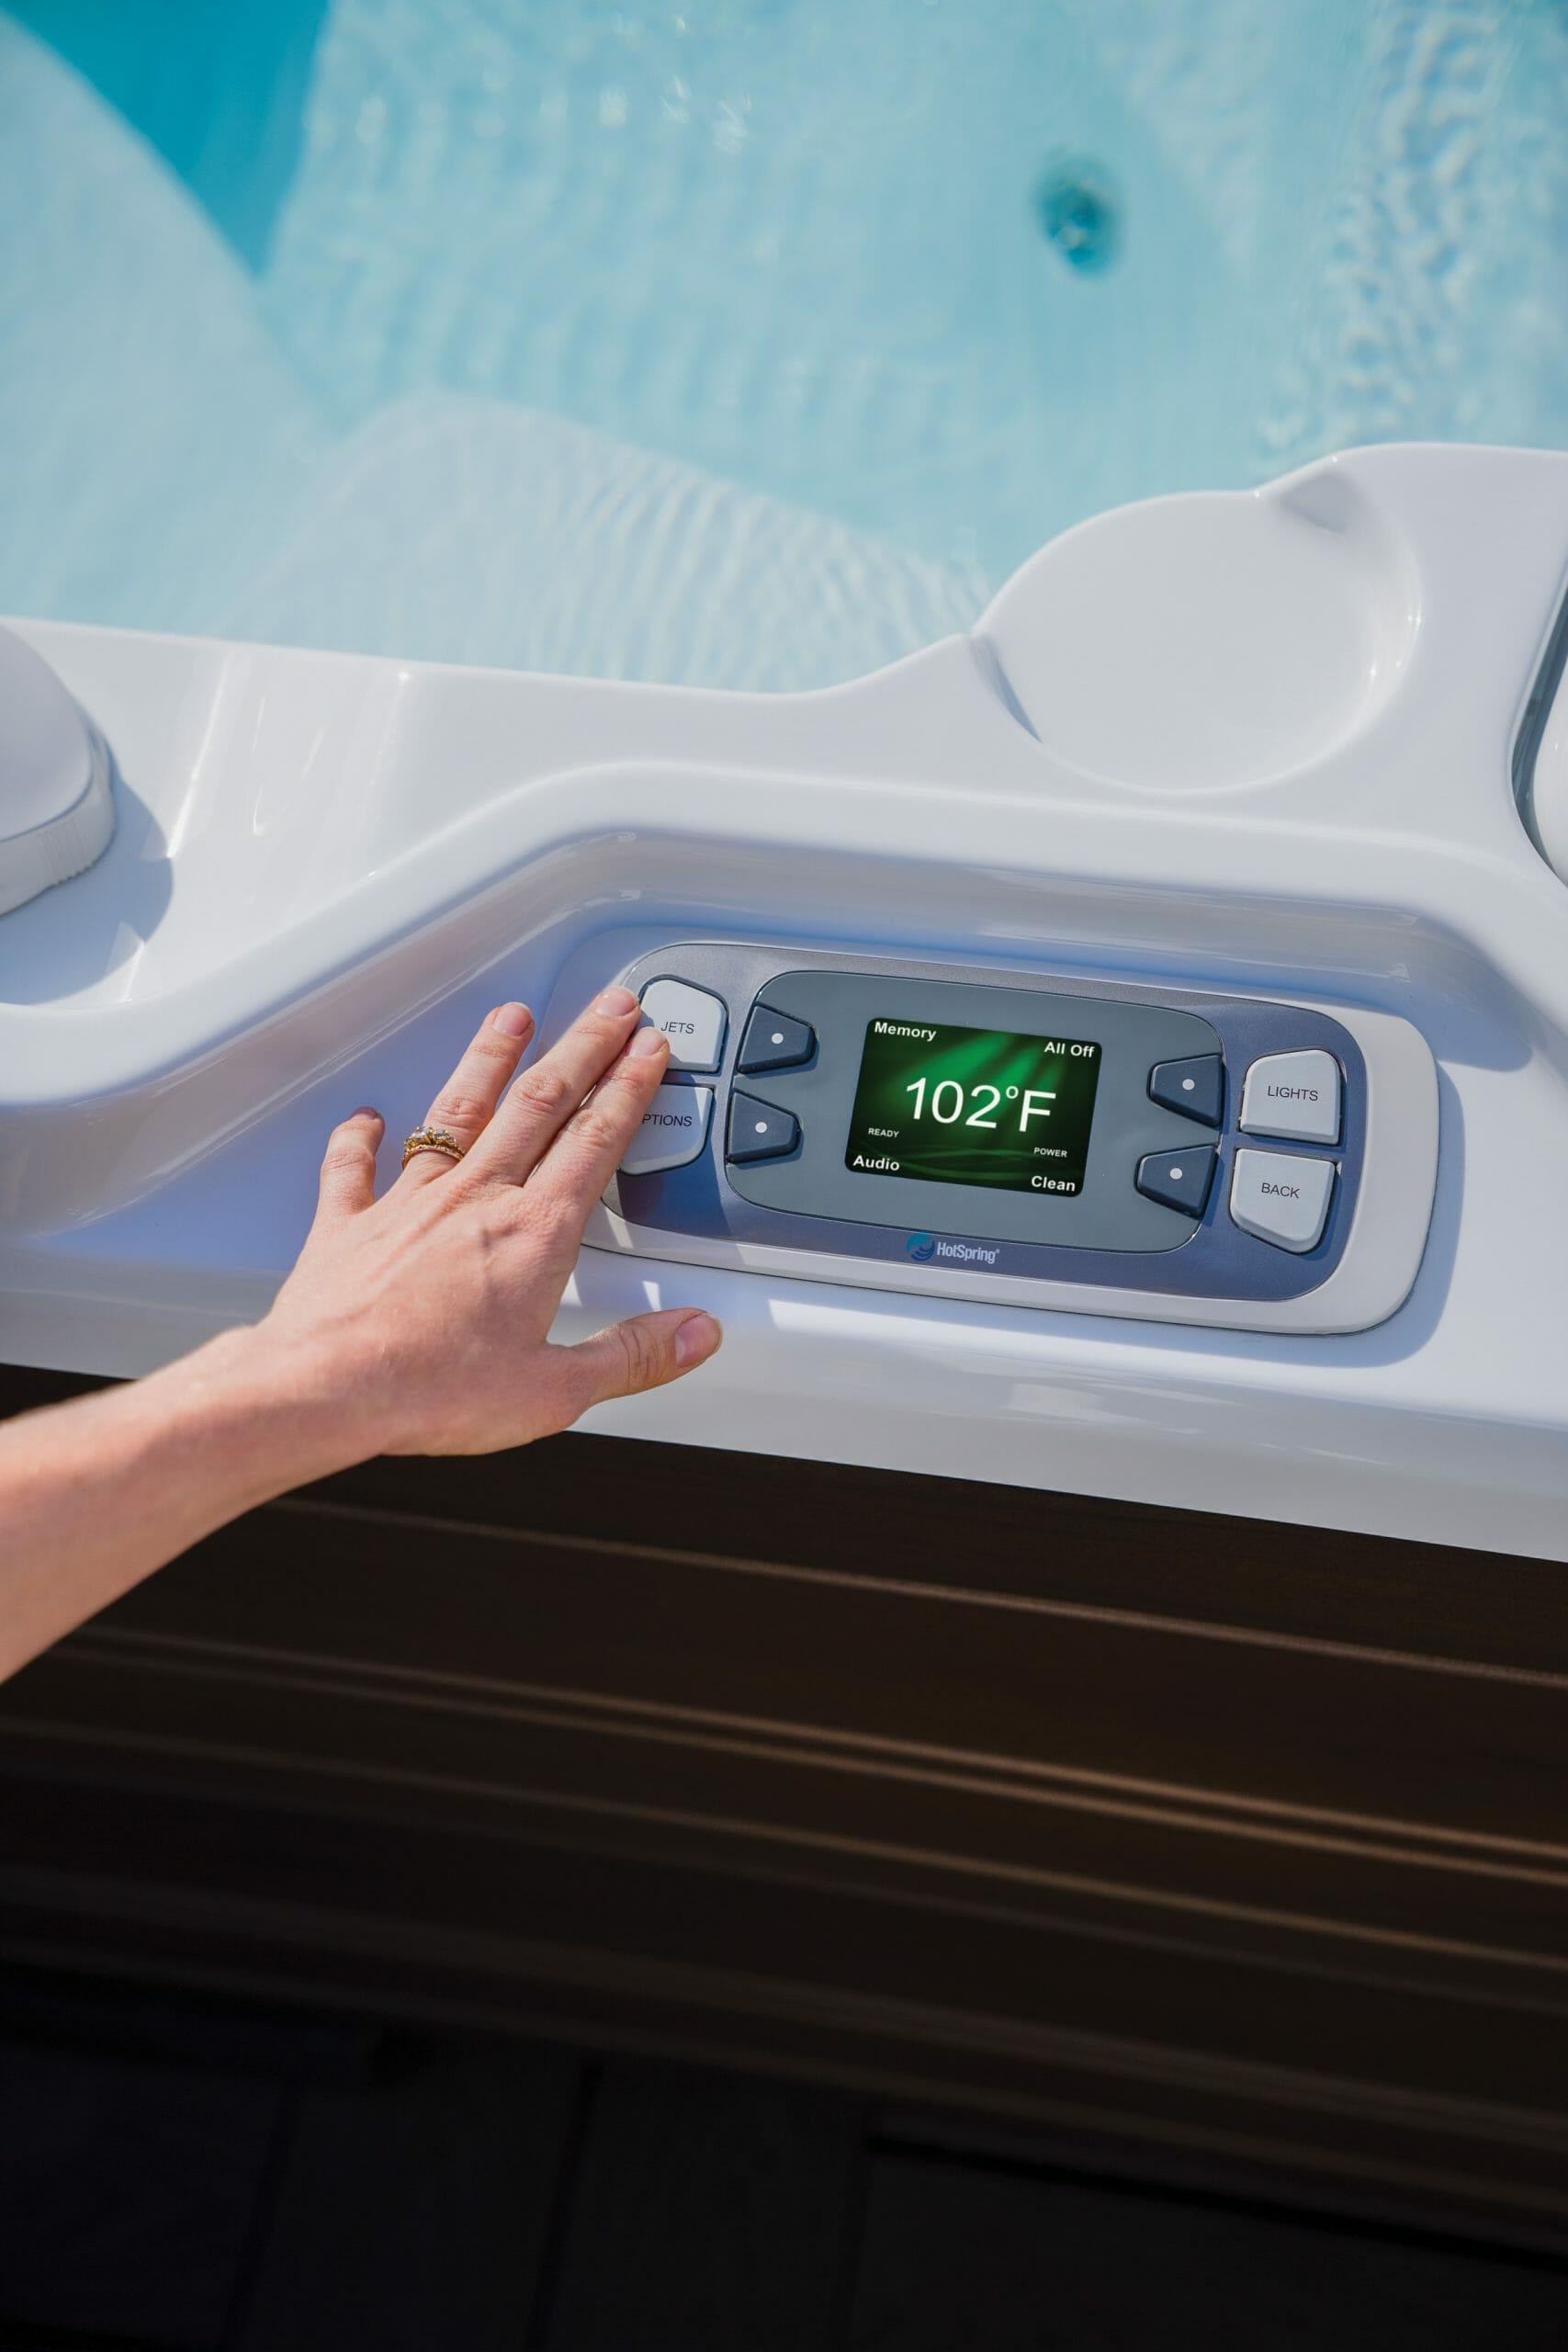 Hot Tub Health Risks: Truth or Myth?